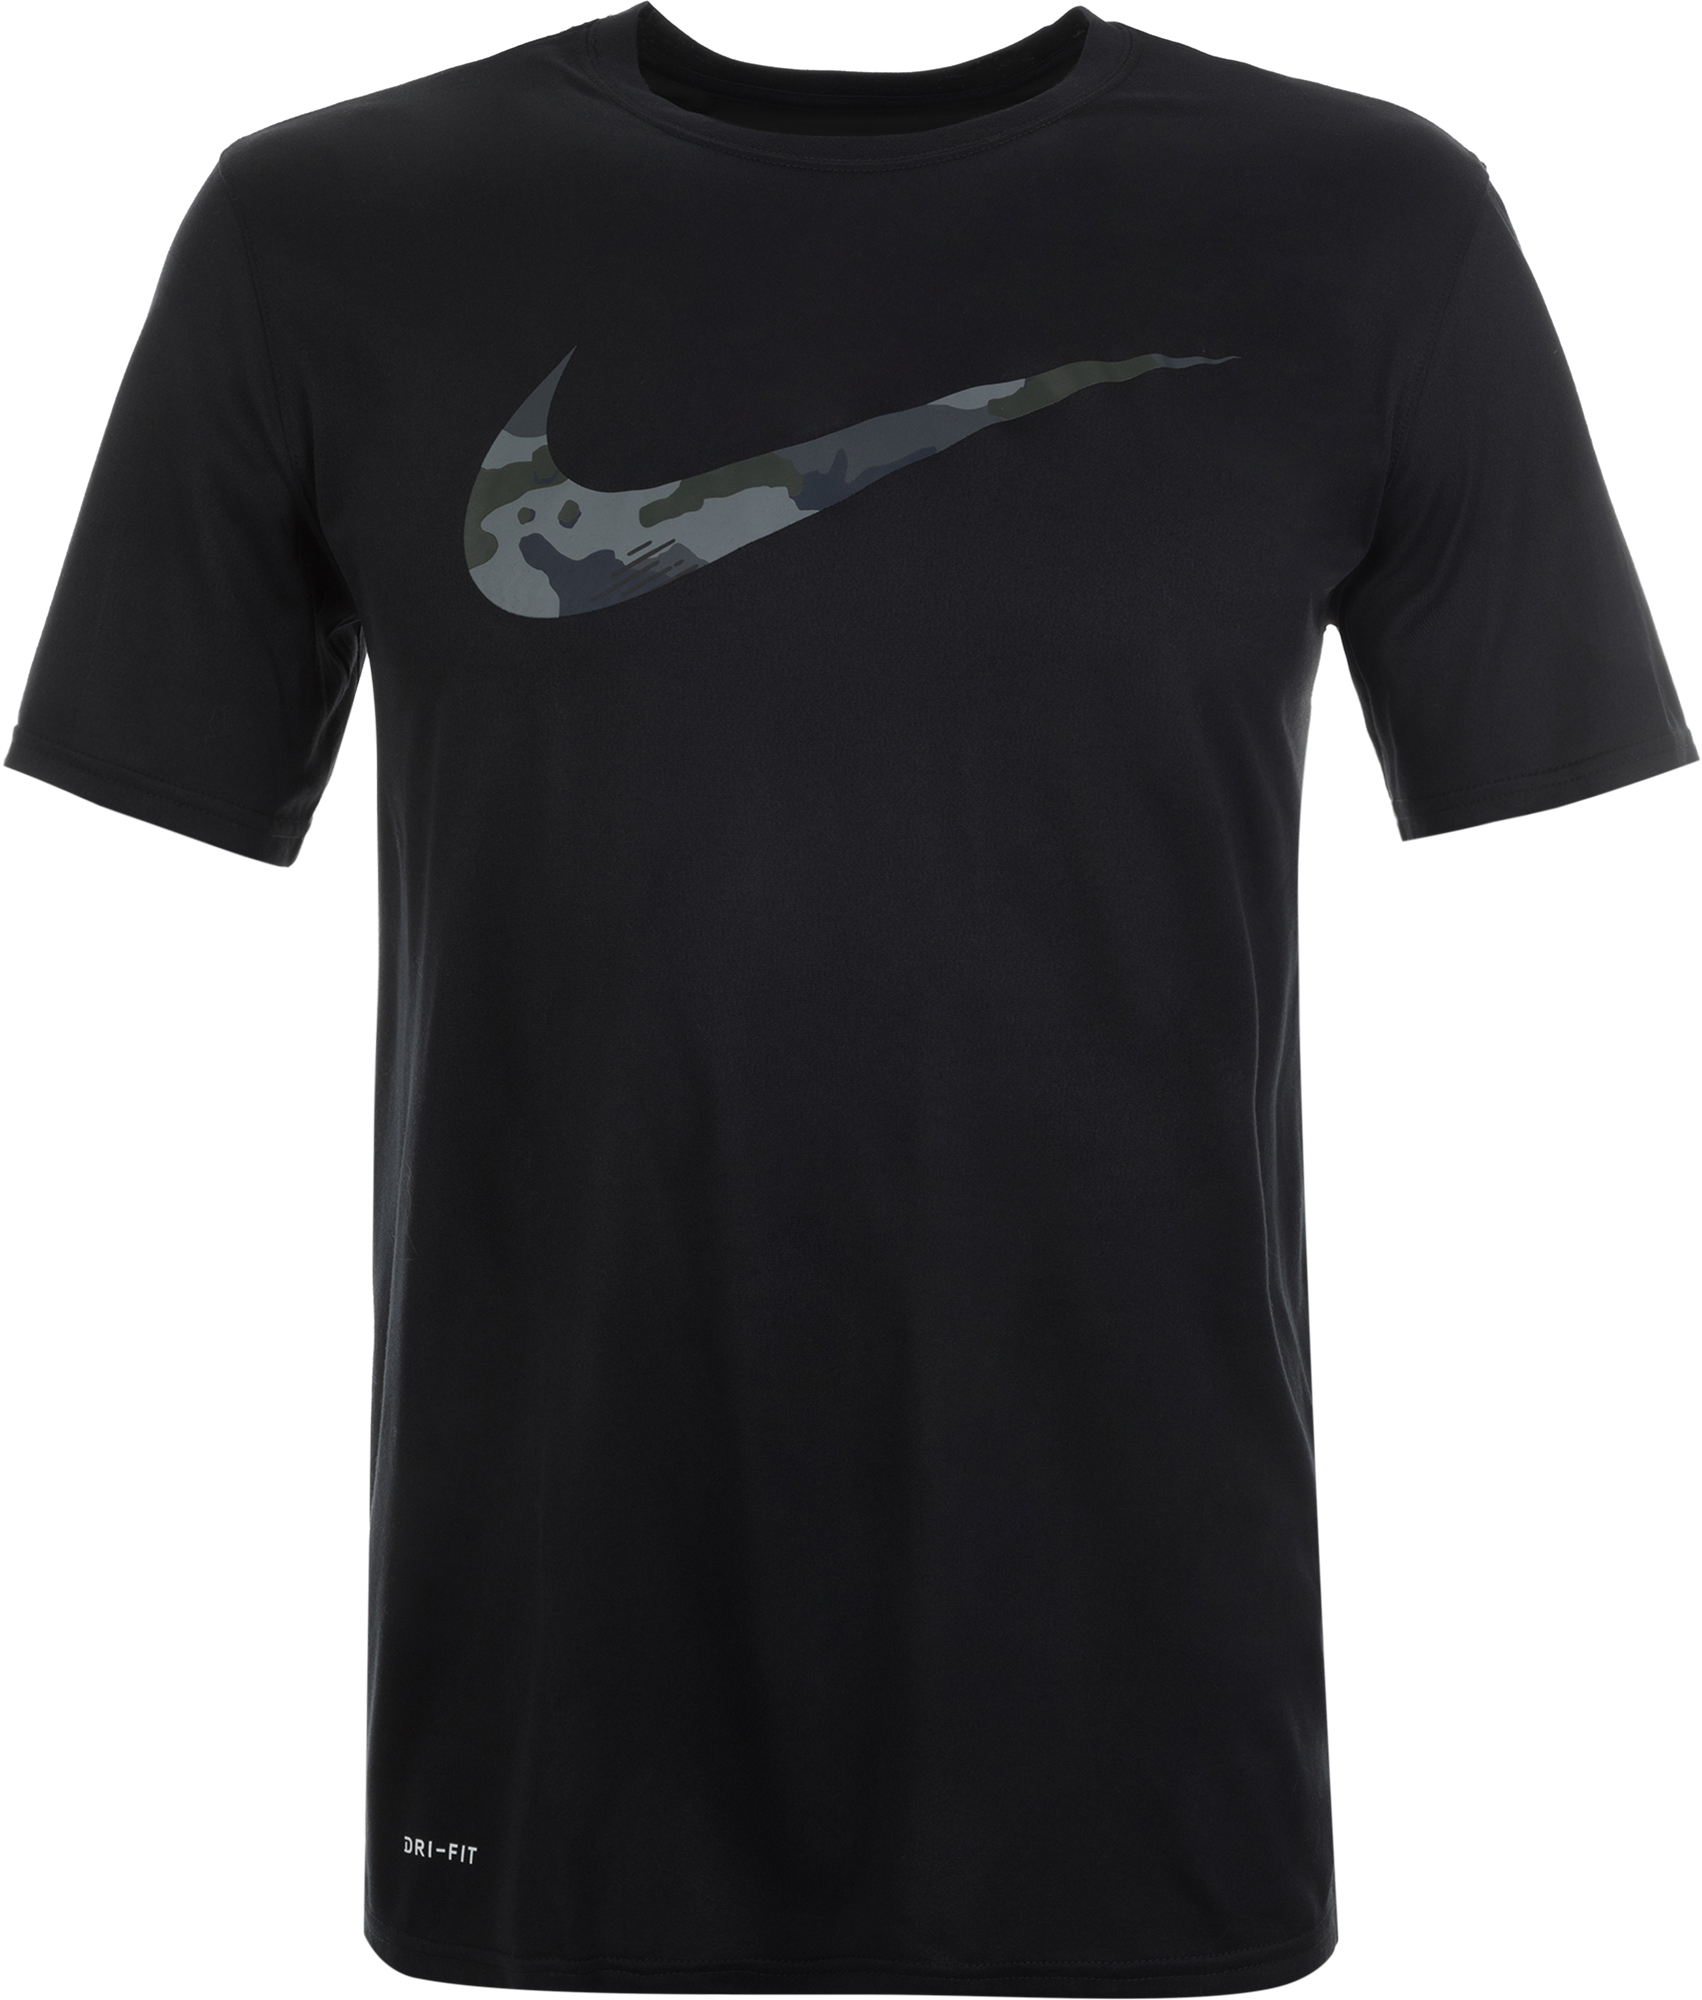 Nike Футболка мужская Nike Dry Legend